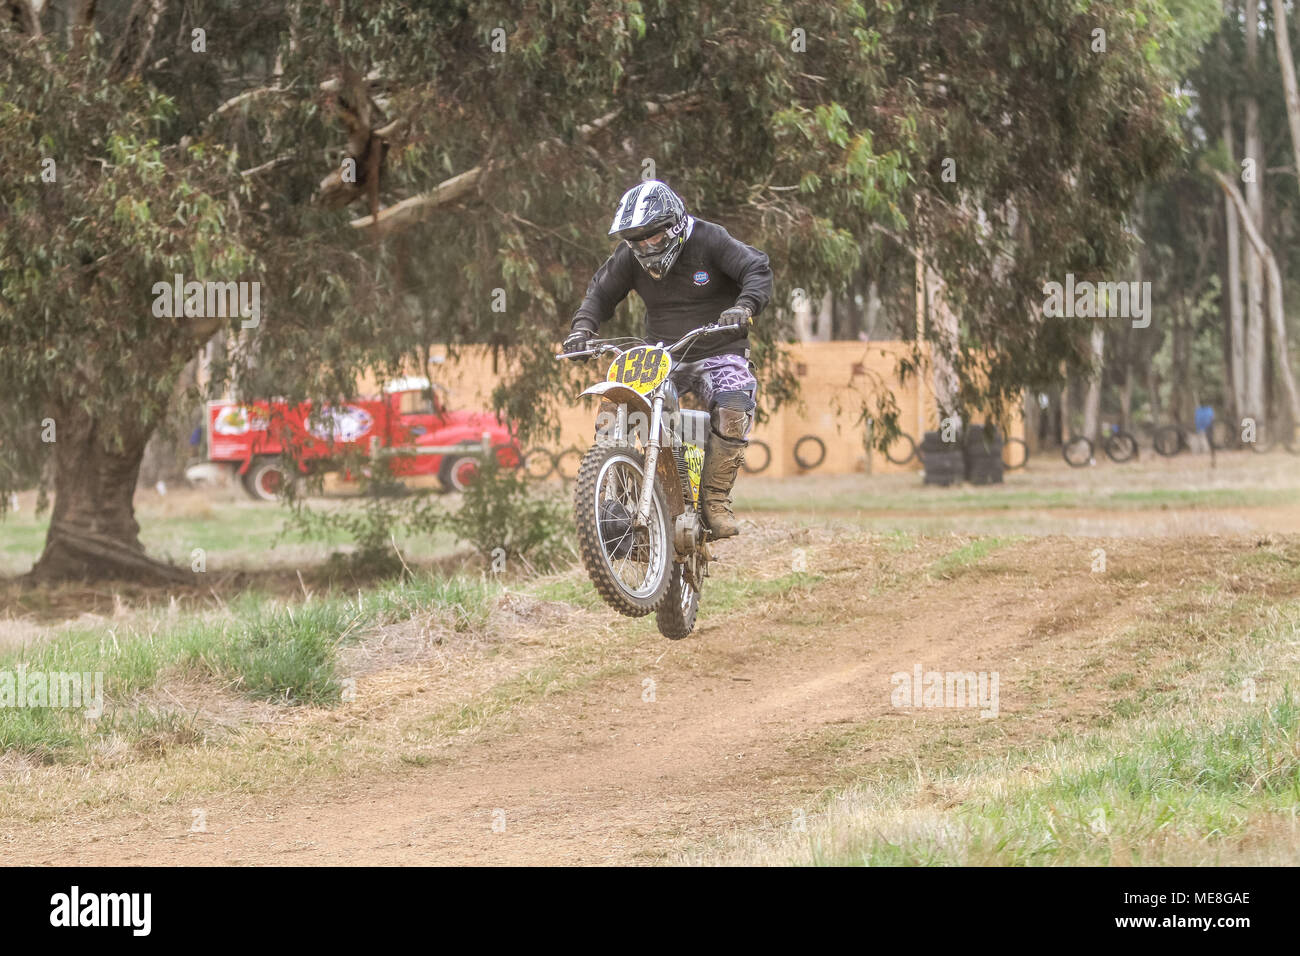 Victoria, Australia, 22 Arpil 2018. Round One of the Classic Scramble Club Series Motor Cross from Lismore Victoria Australia Credit: brett keating/Alamy Live News - Stock Image